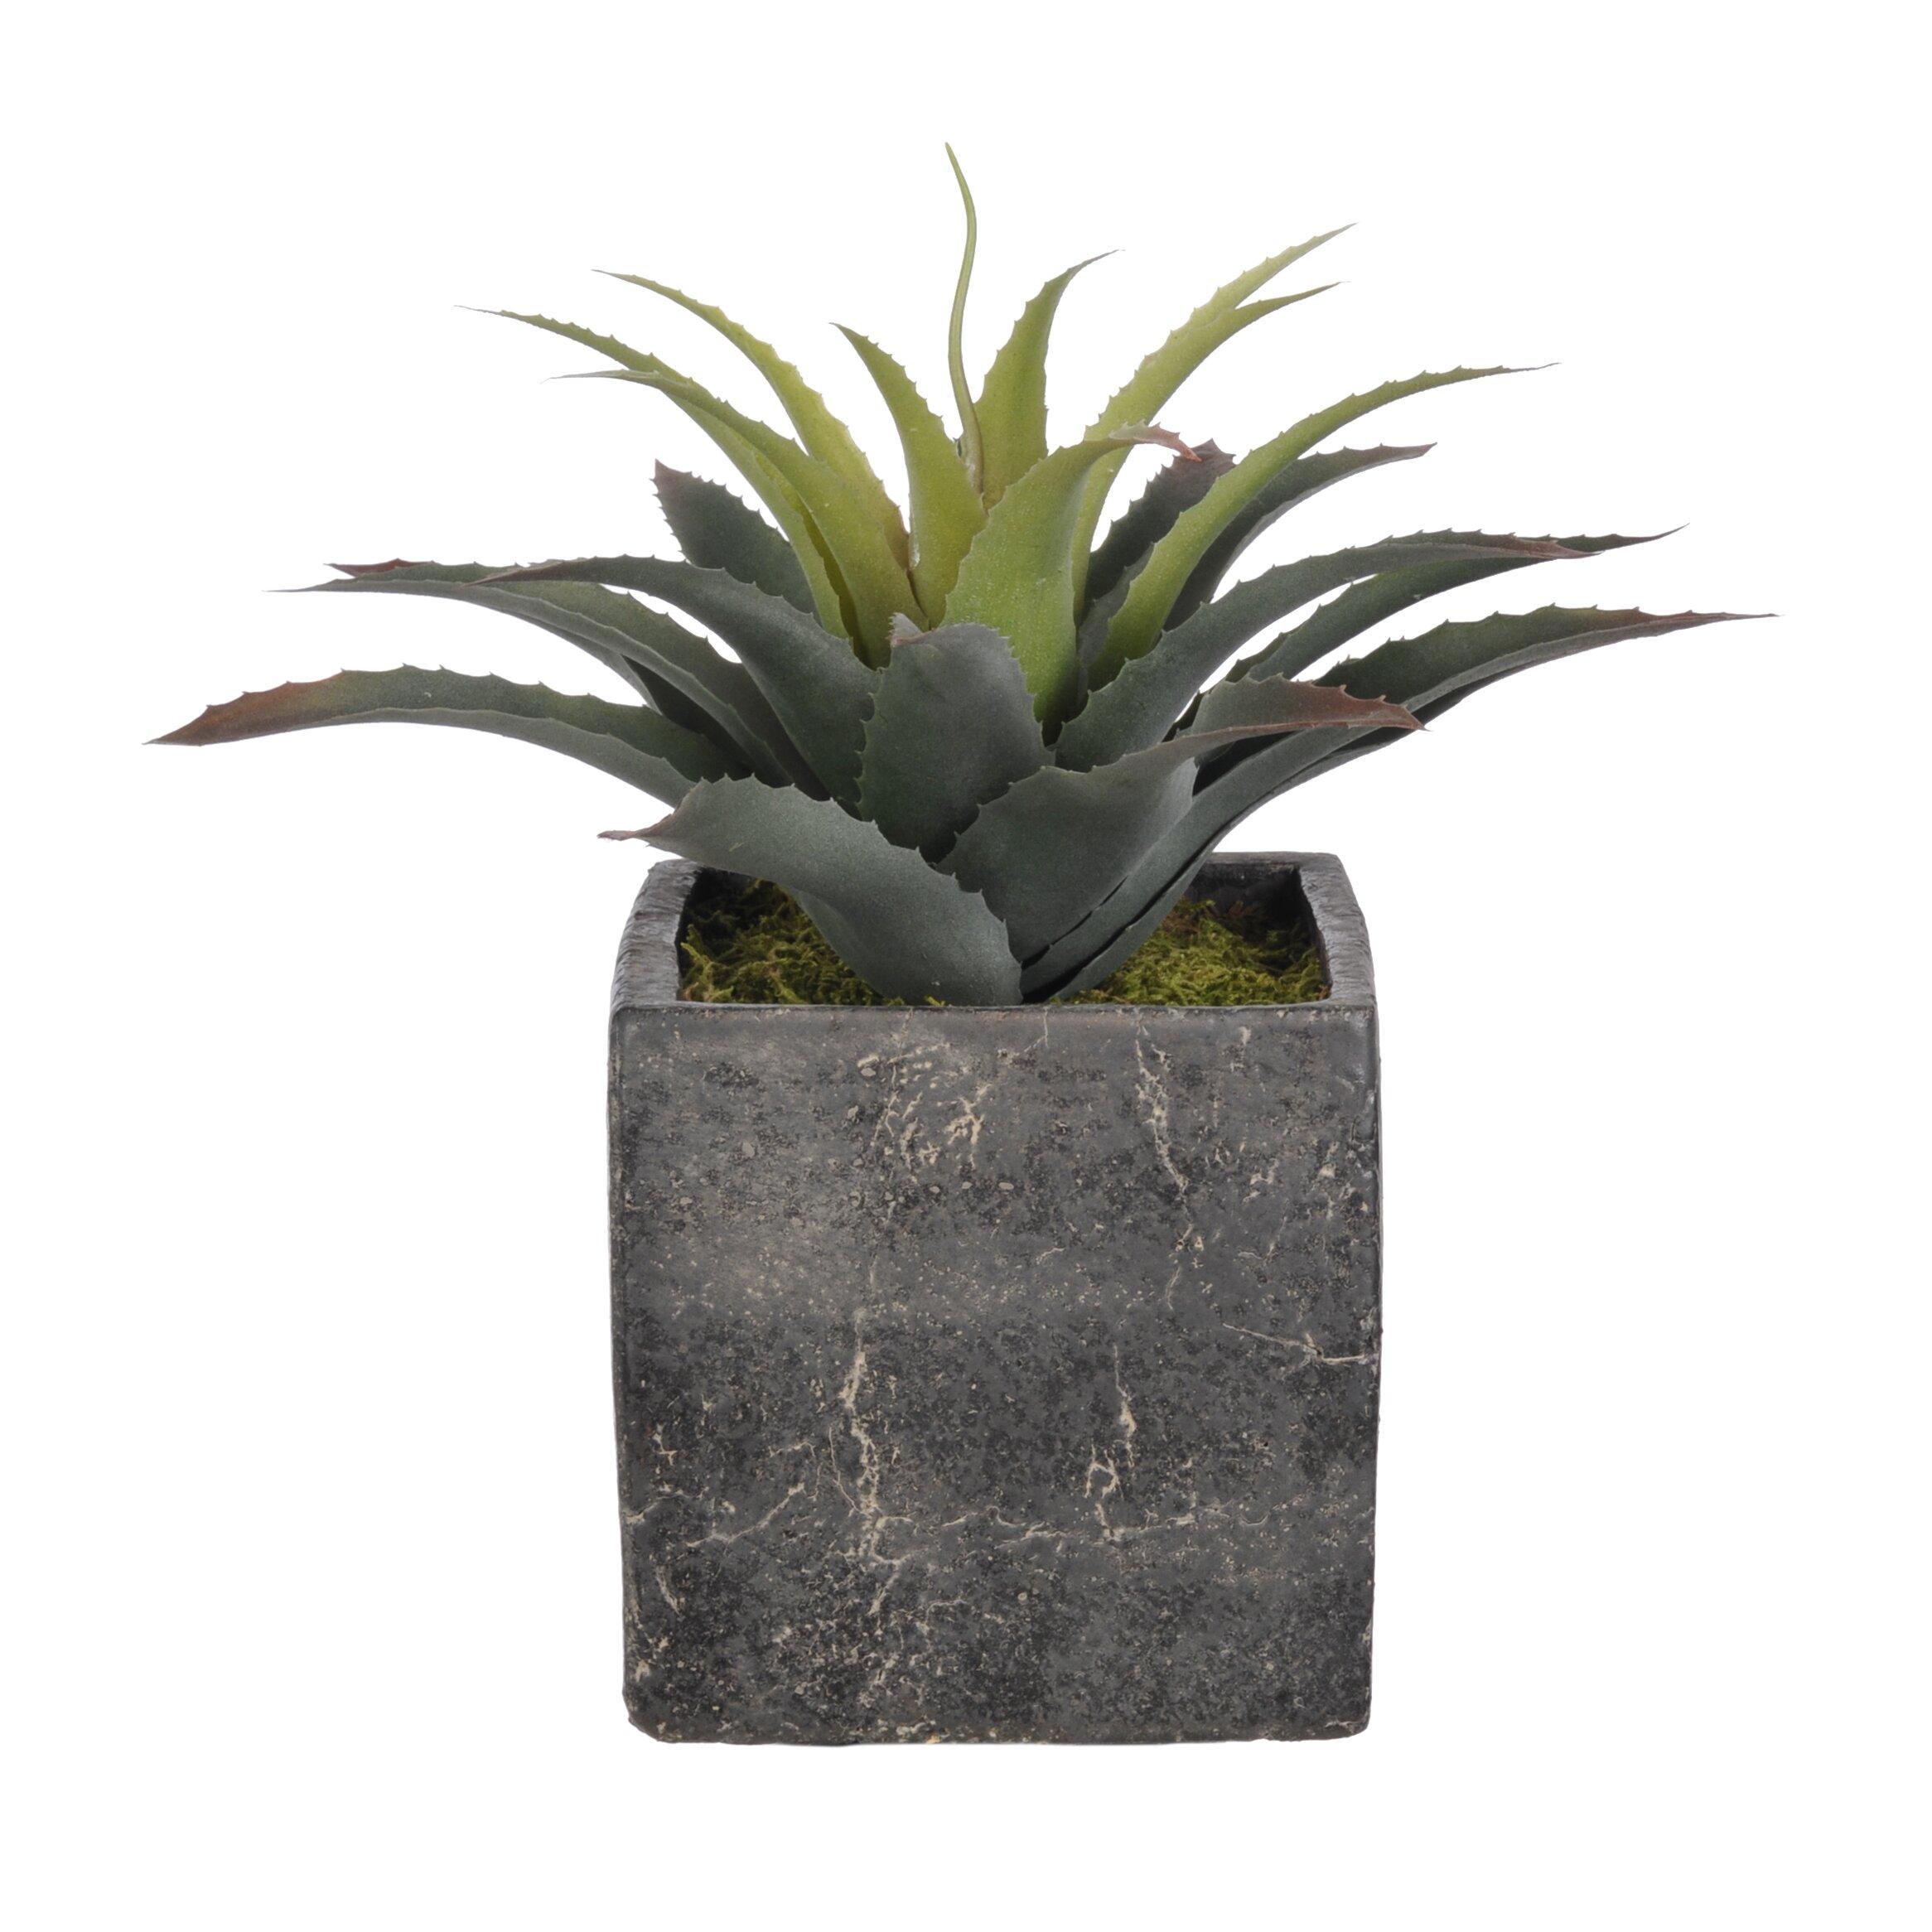 House of silk flowers artificial star succulent desk top plant in cube pot reviews wayfair - Flowering succulent house plants ...